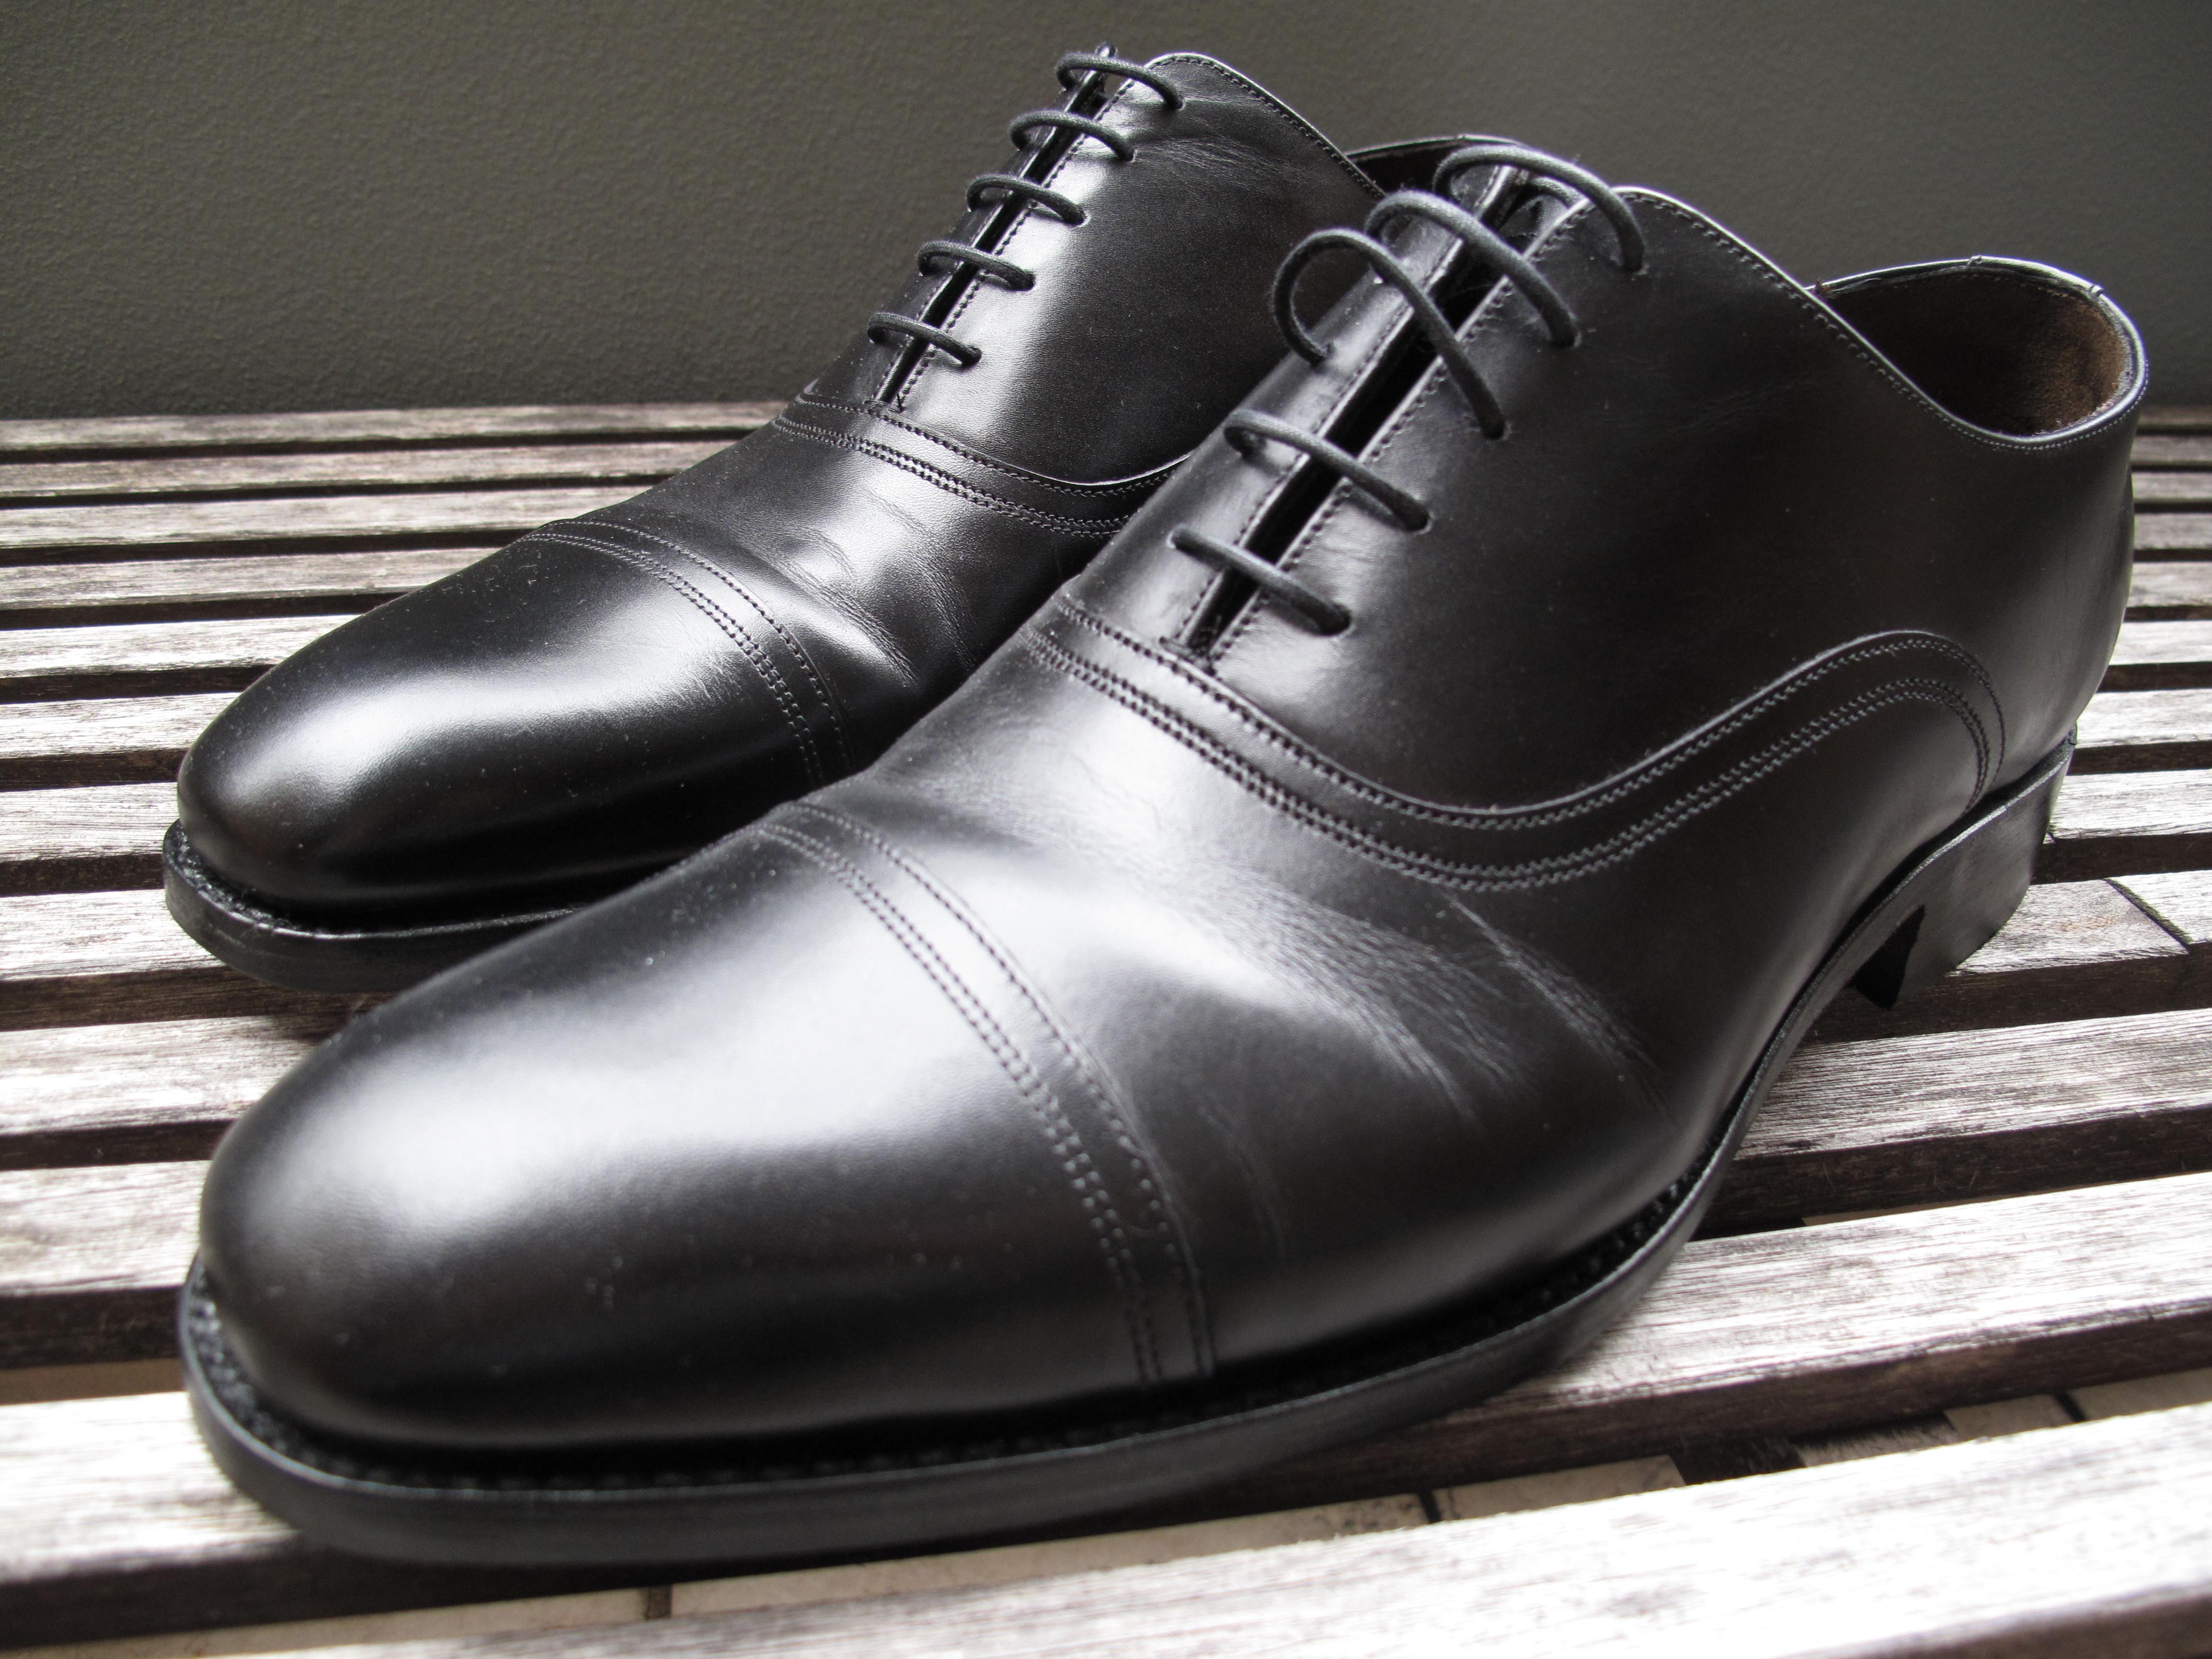 c37b265b251 Barker Goodrich Shoe in Black Calf http   www.ebay.com.au itm 200795778952